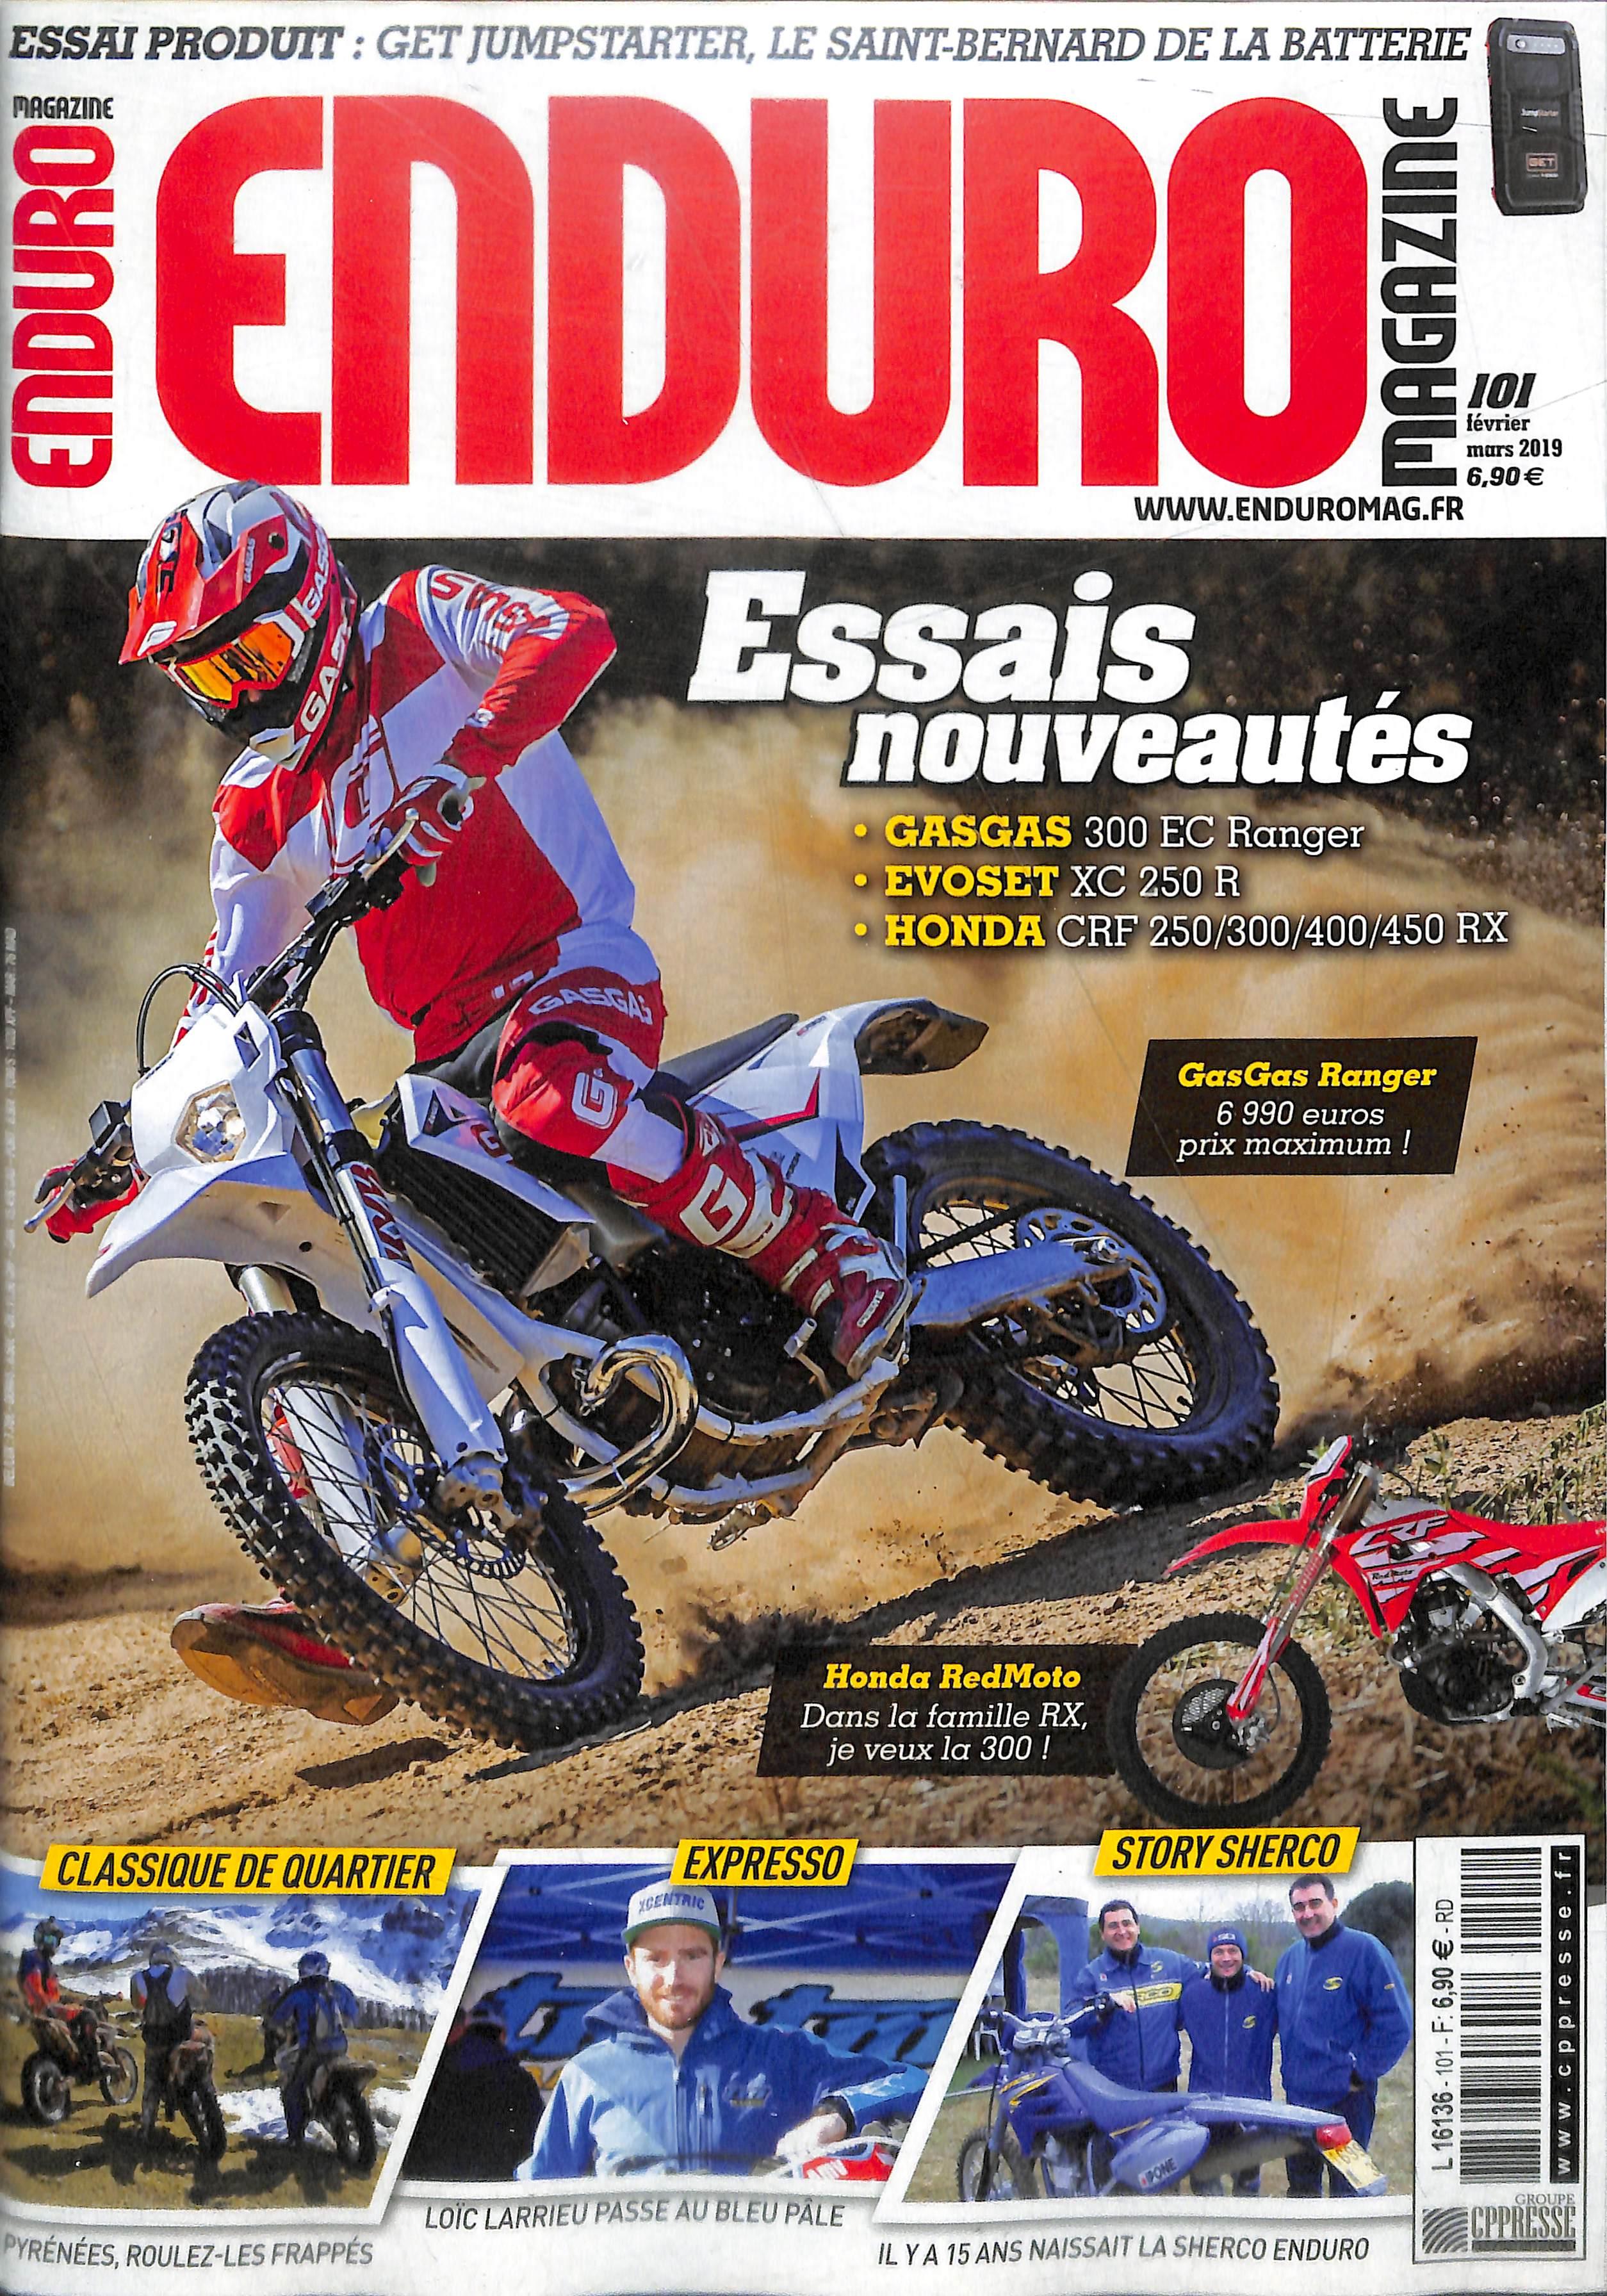 Enduro magazine N° 101 Février 2019